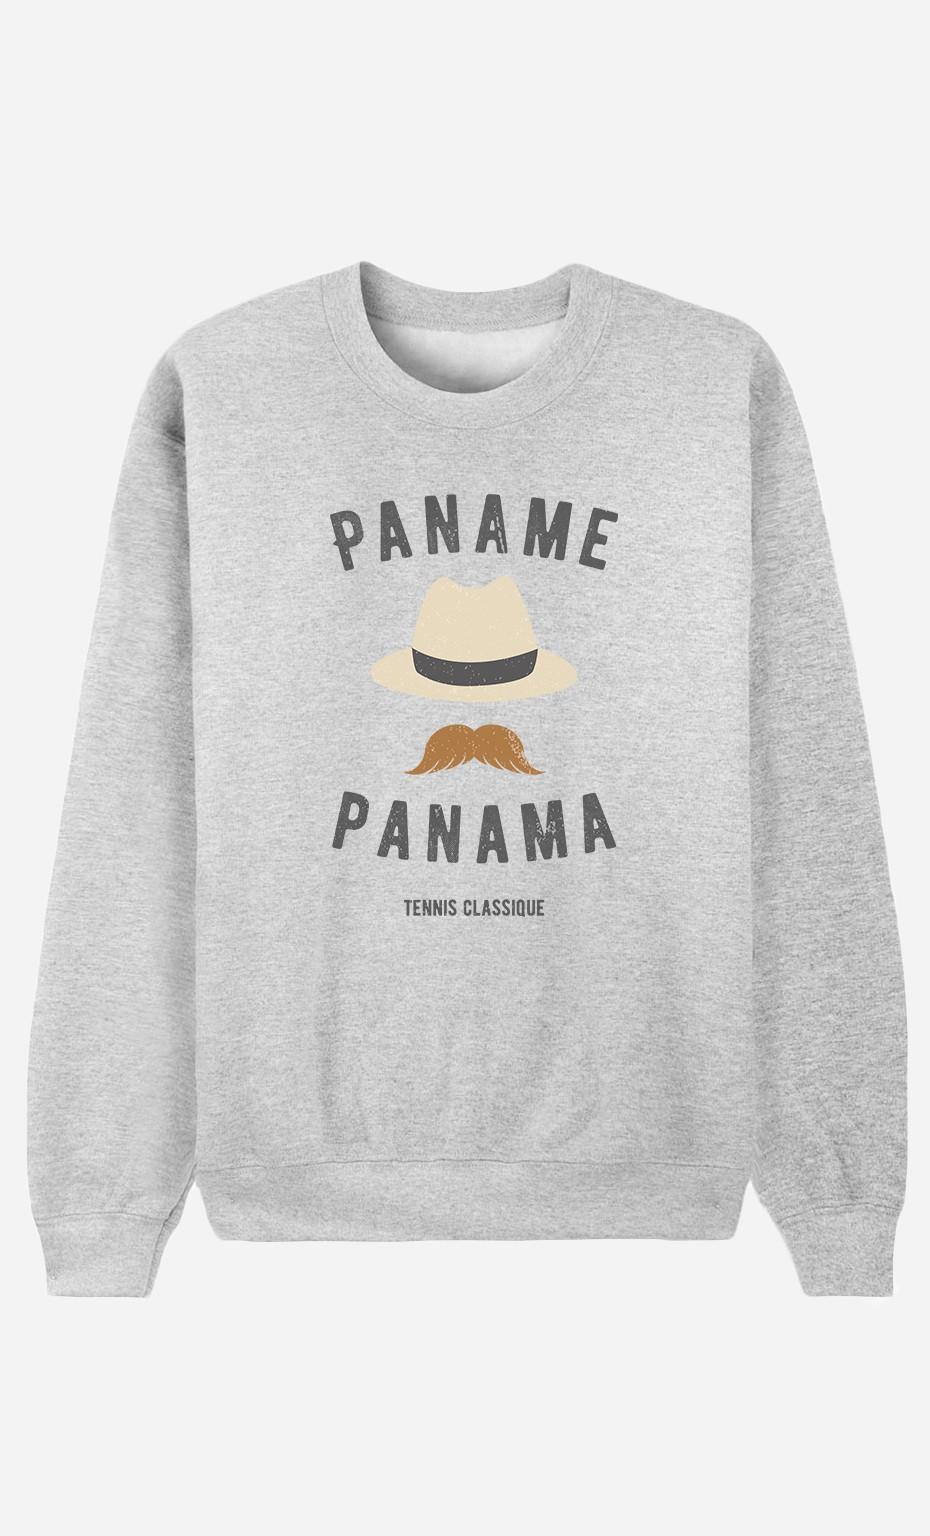 Sweat Femme Paname Panama